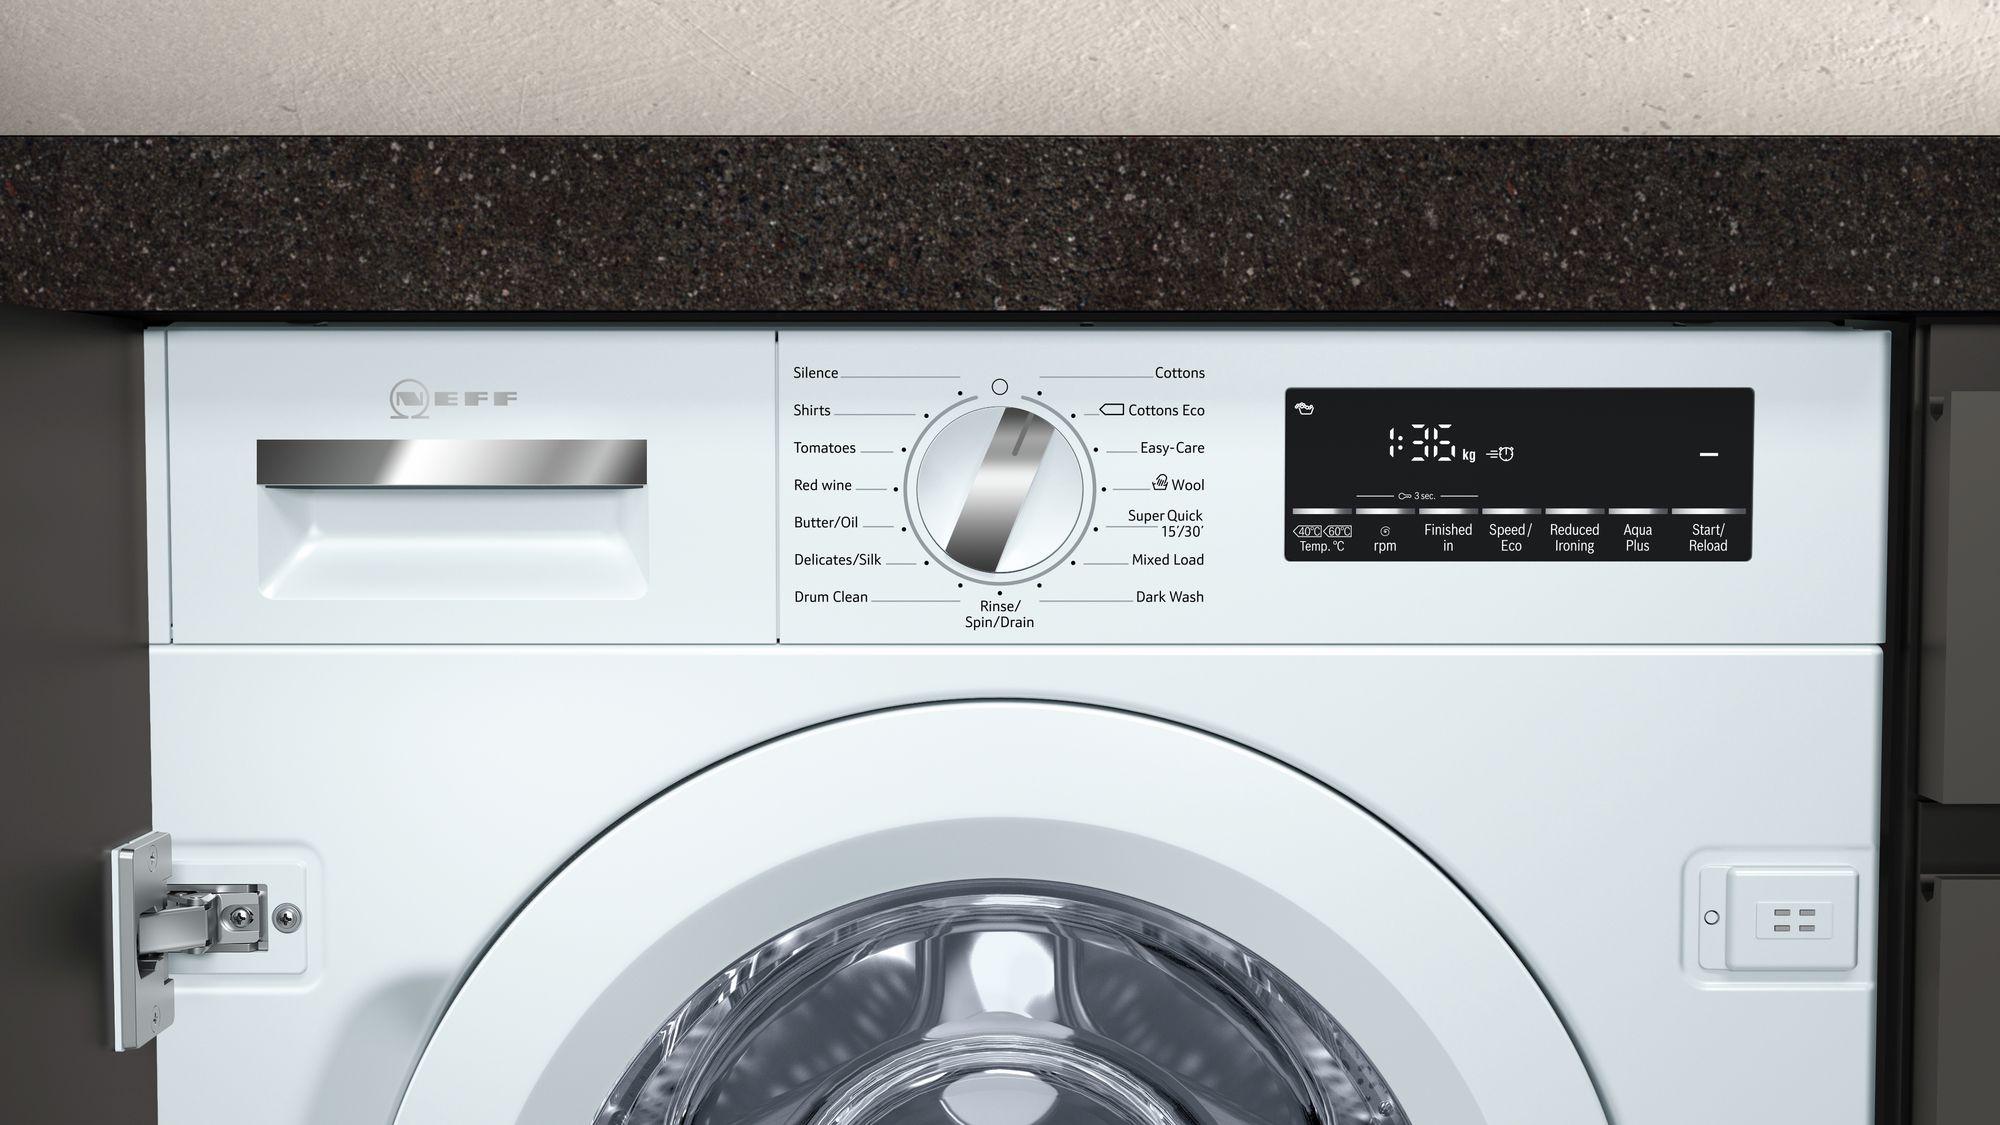 Neff W544bx0gb Fully Integrated Washing Machine Which